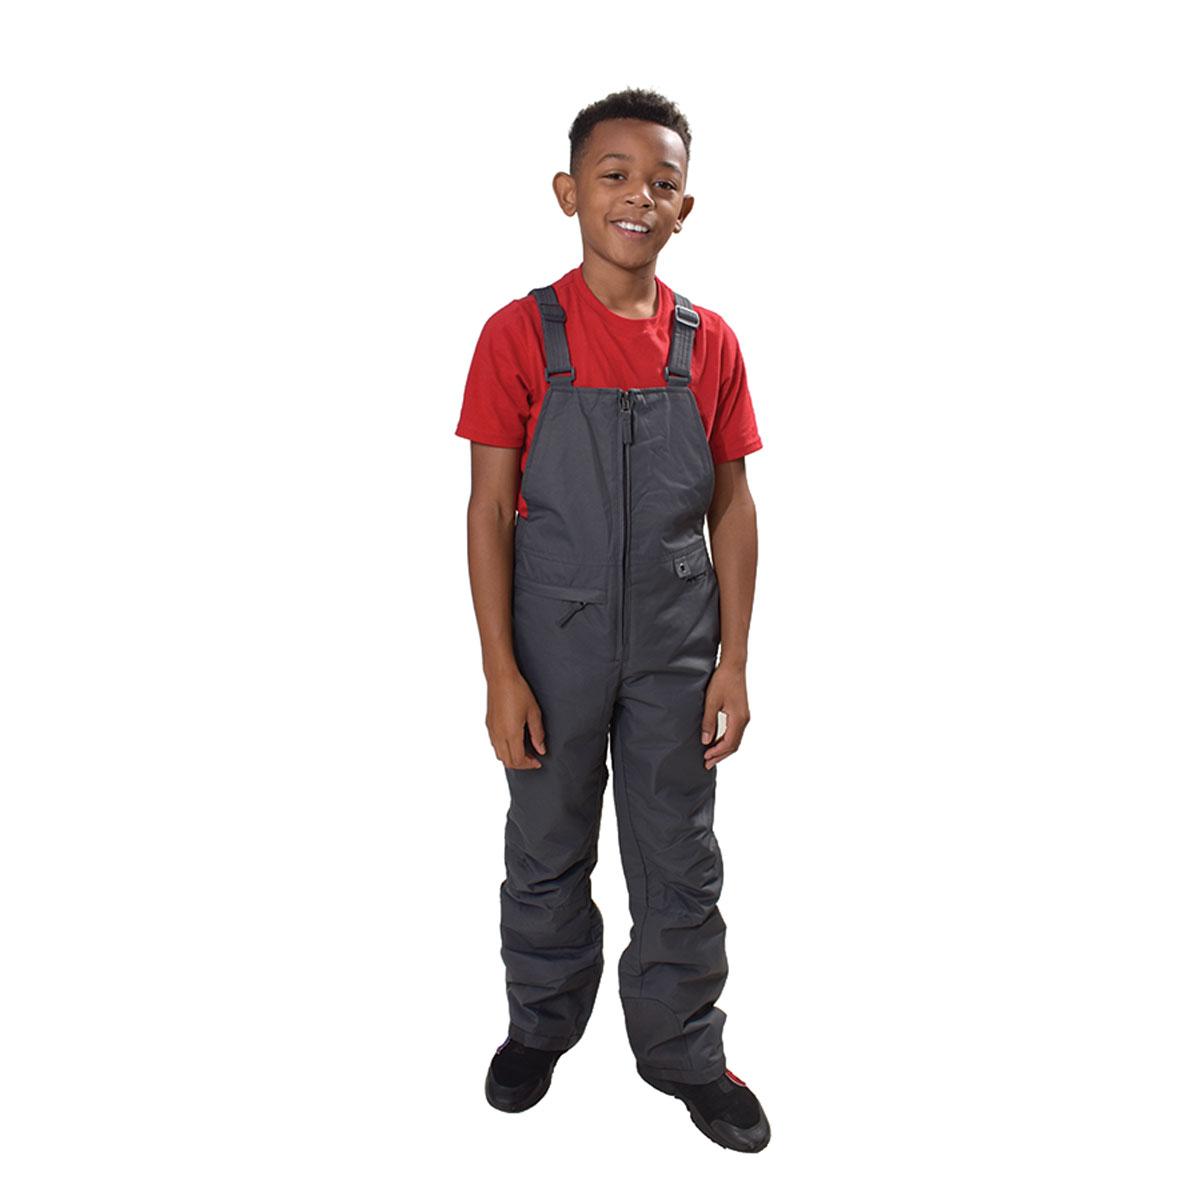 Boys' Insulated Bib Overalls, Charcoal,Smoke,Steel, swatch